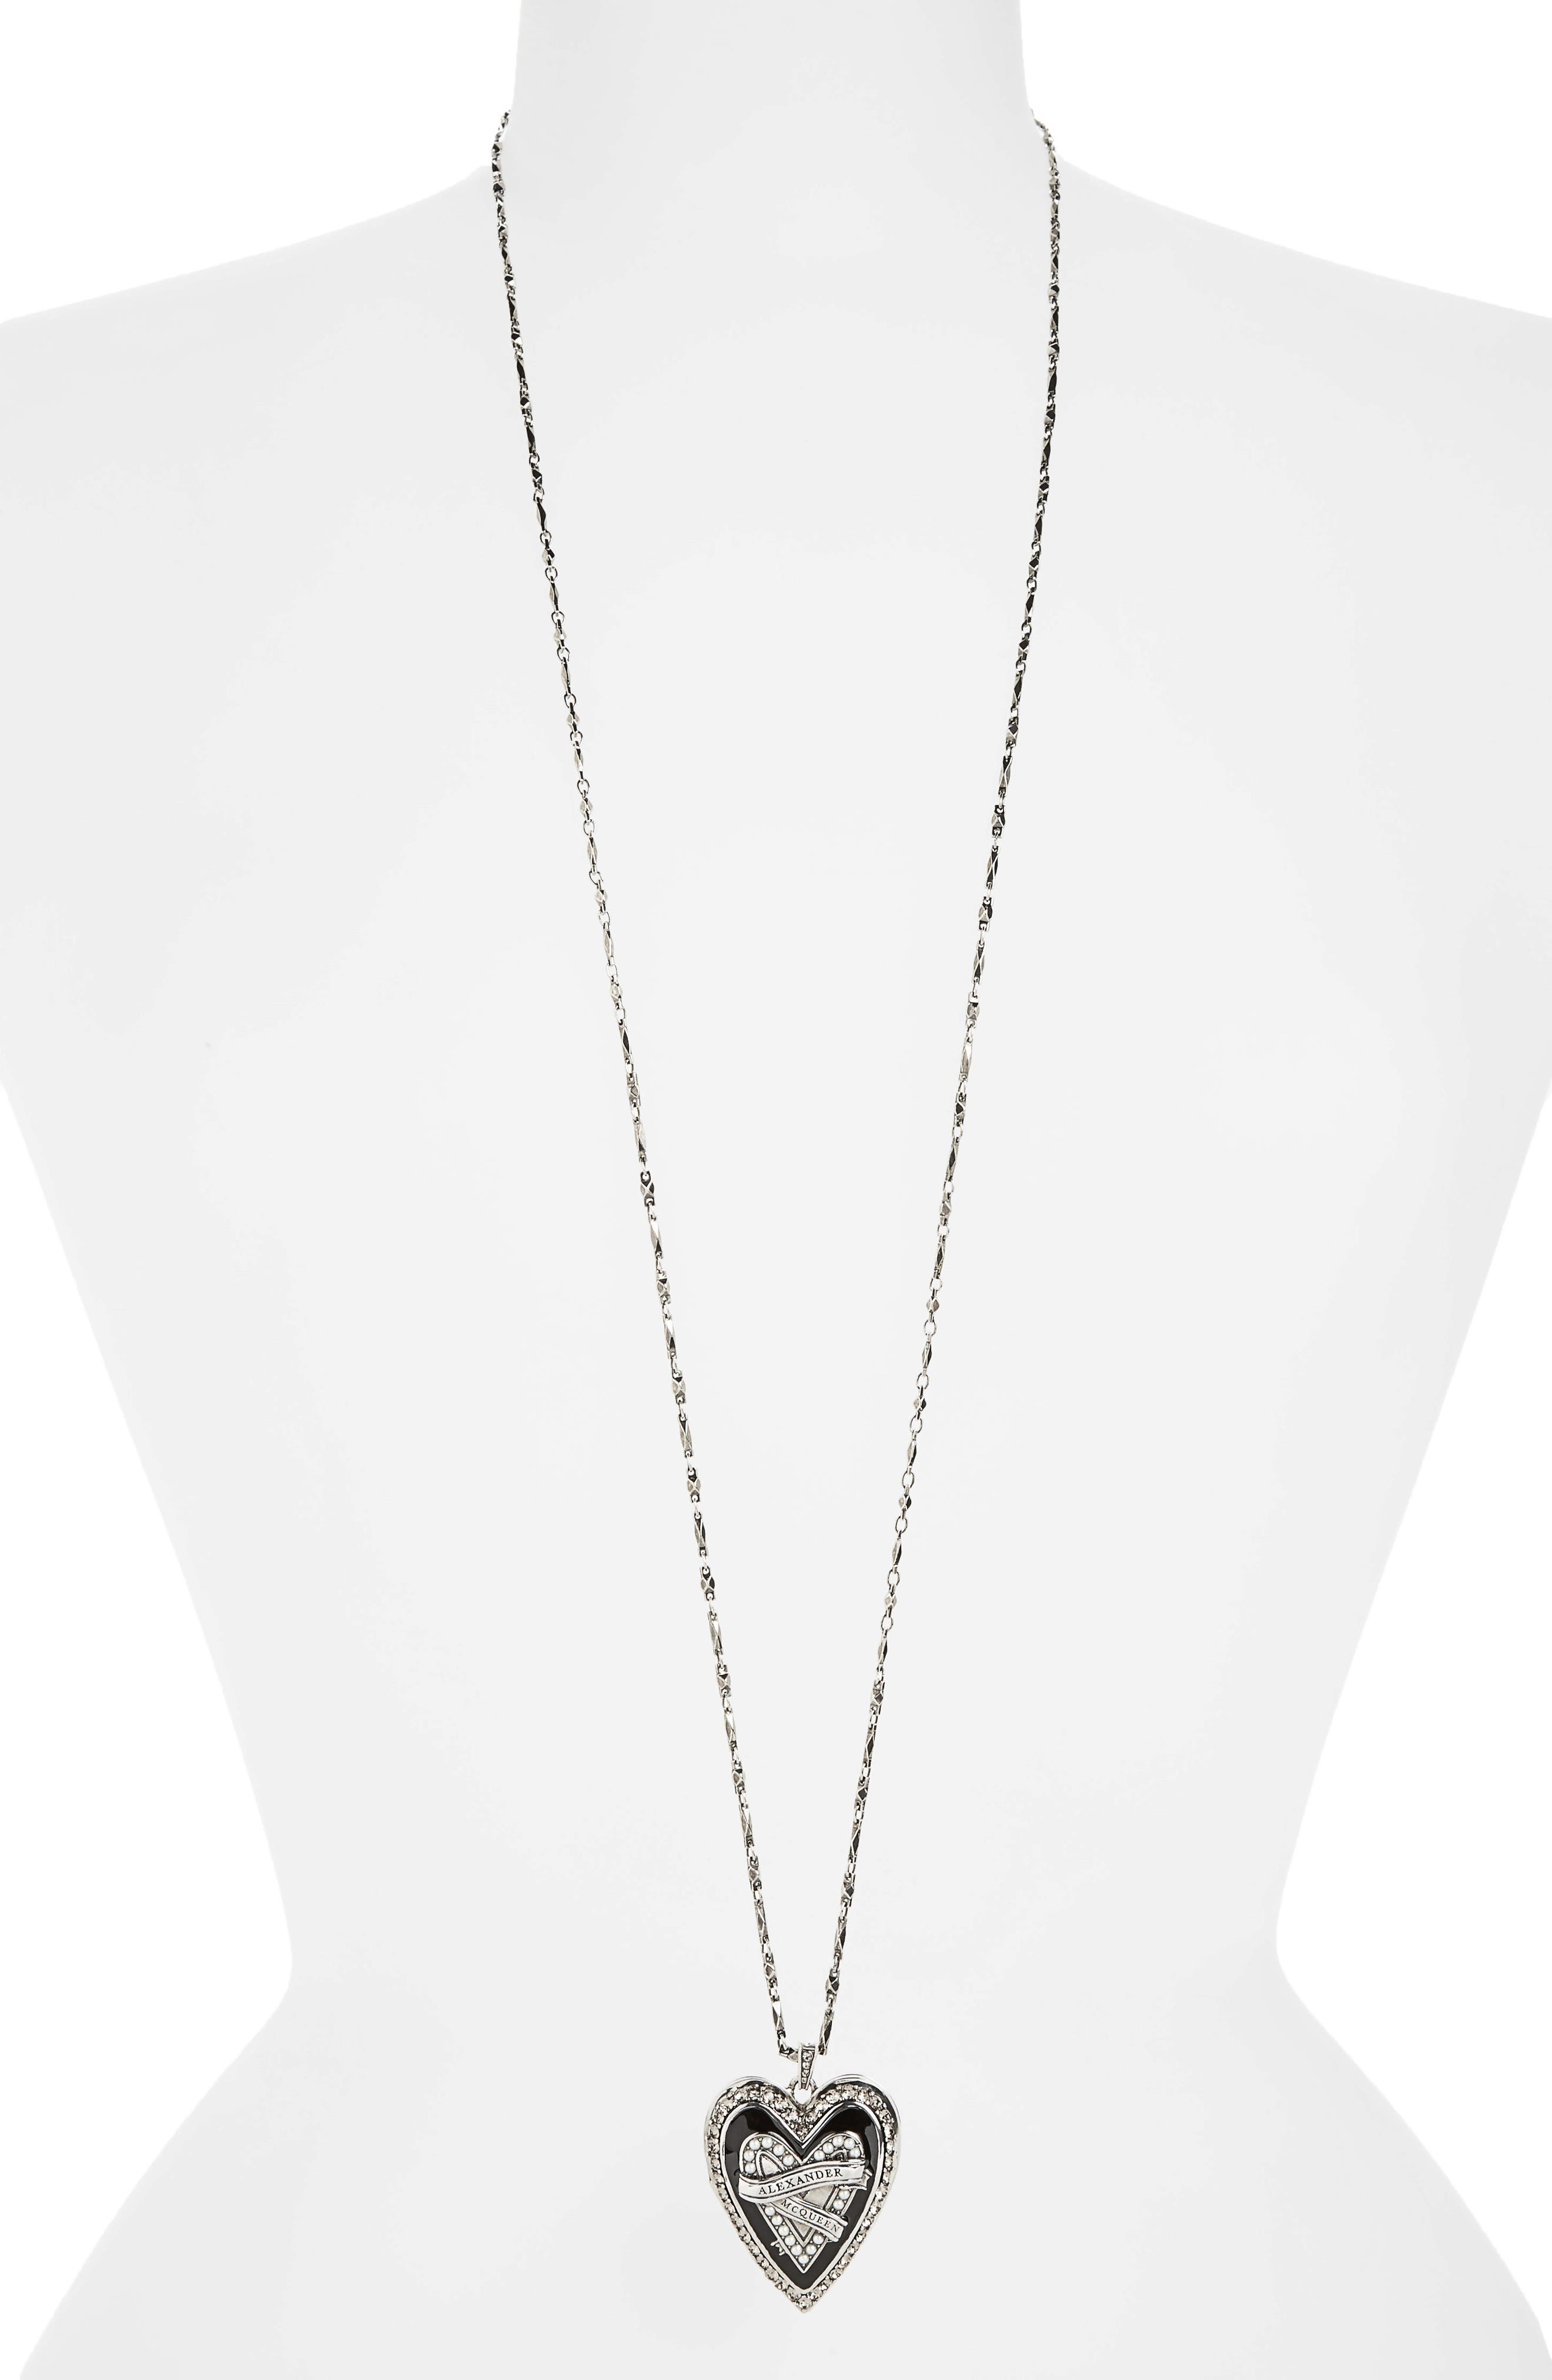 Main Image - Alexander McQueen Heart Pendant Necklace